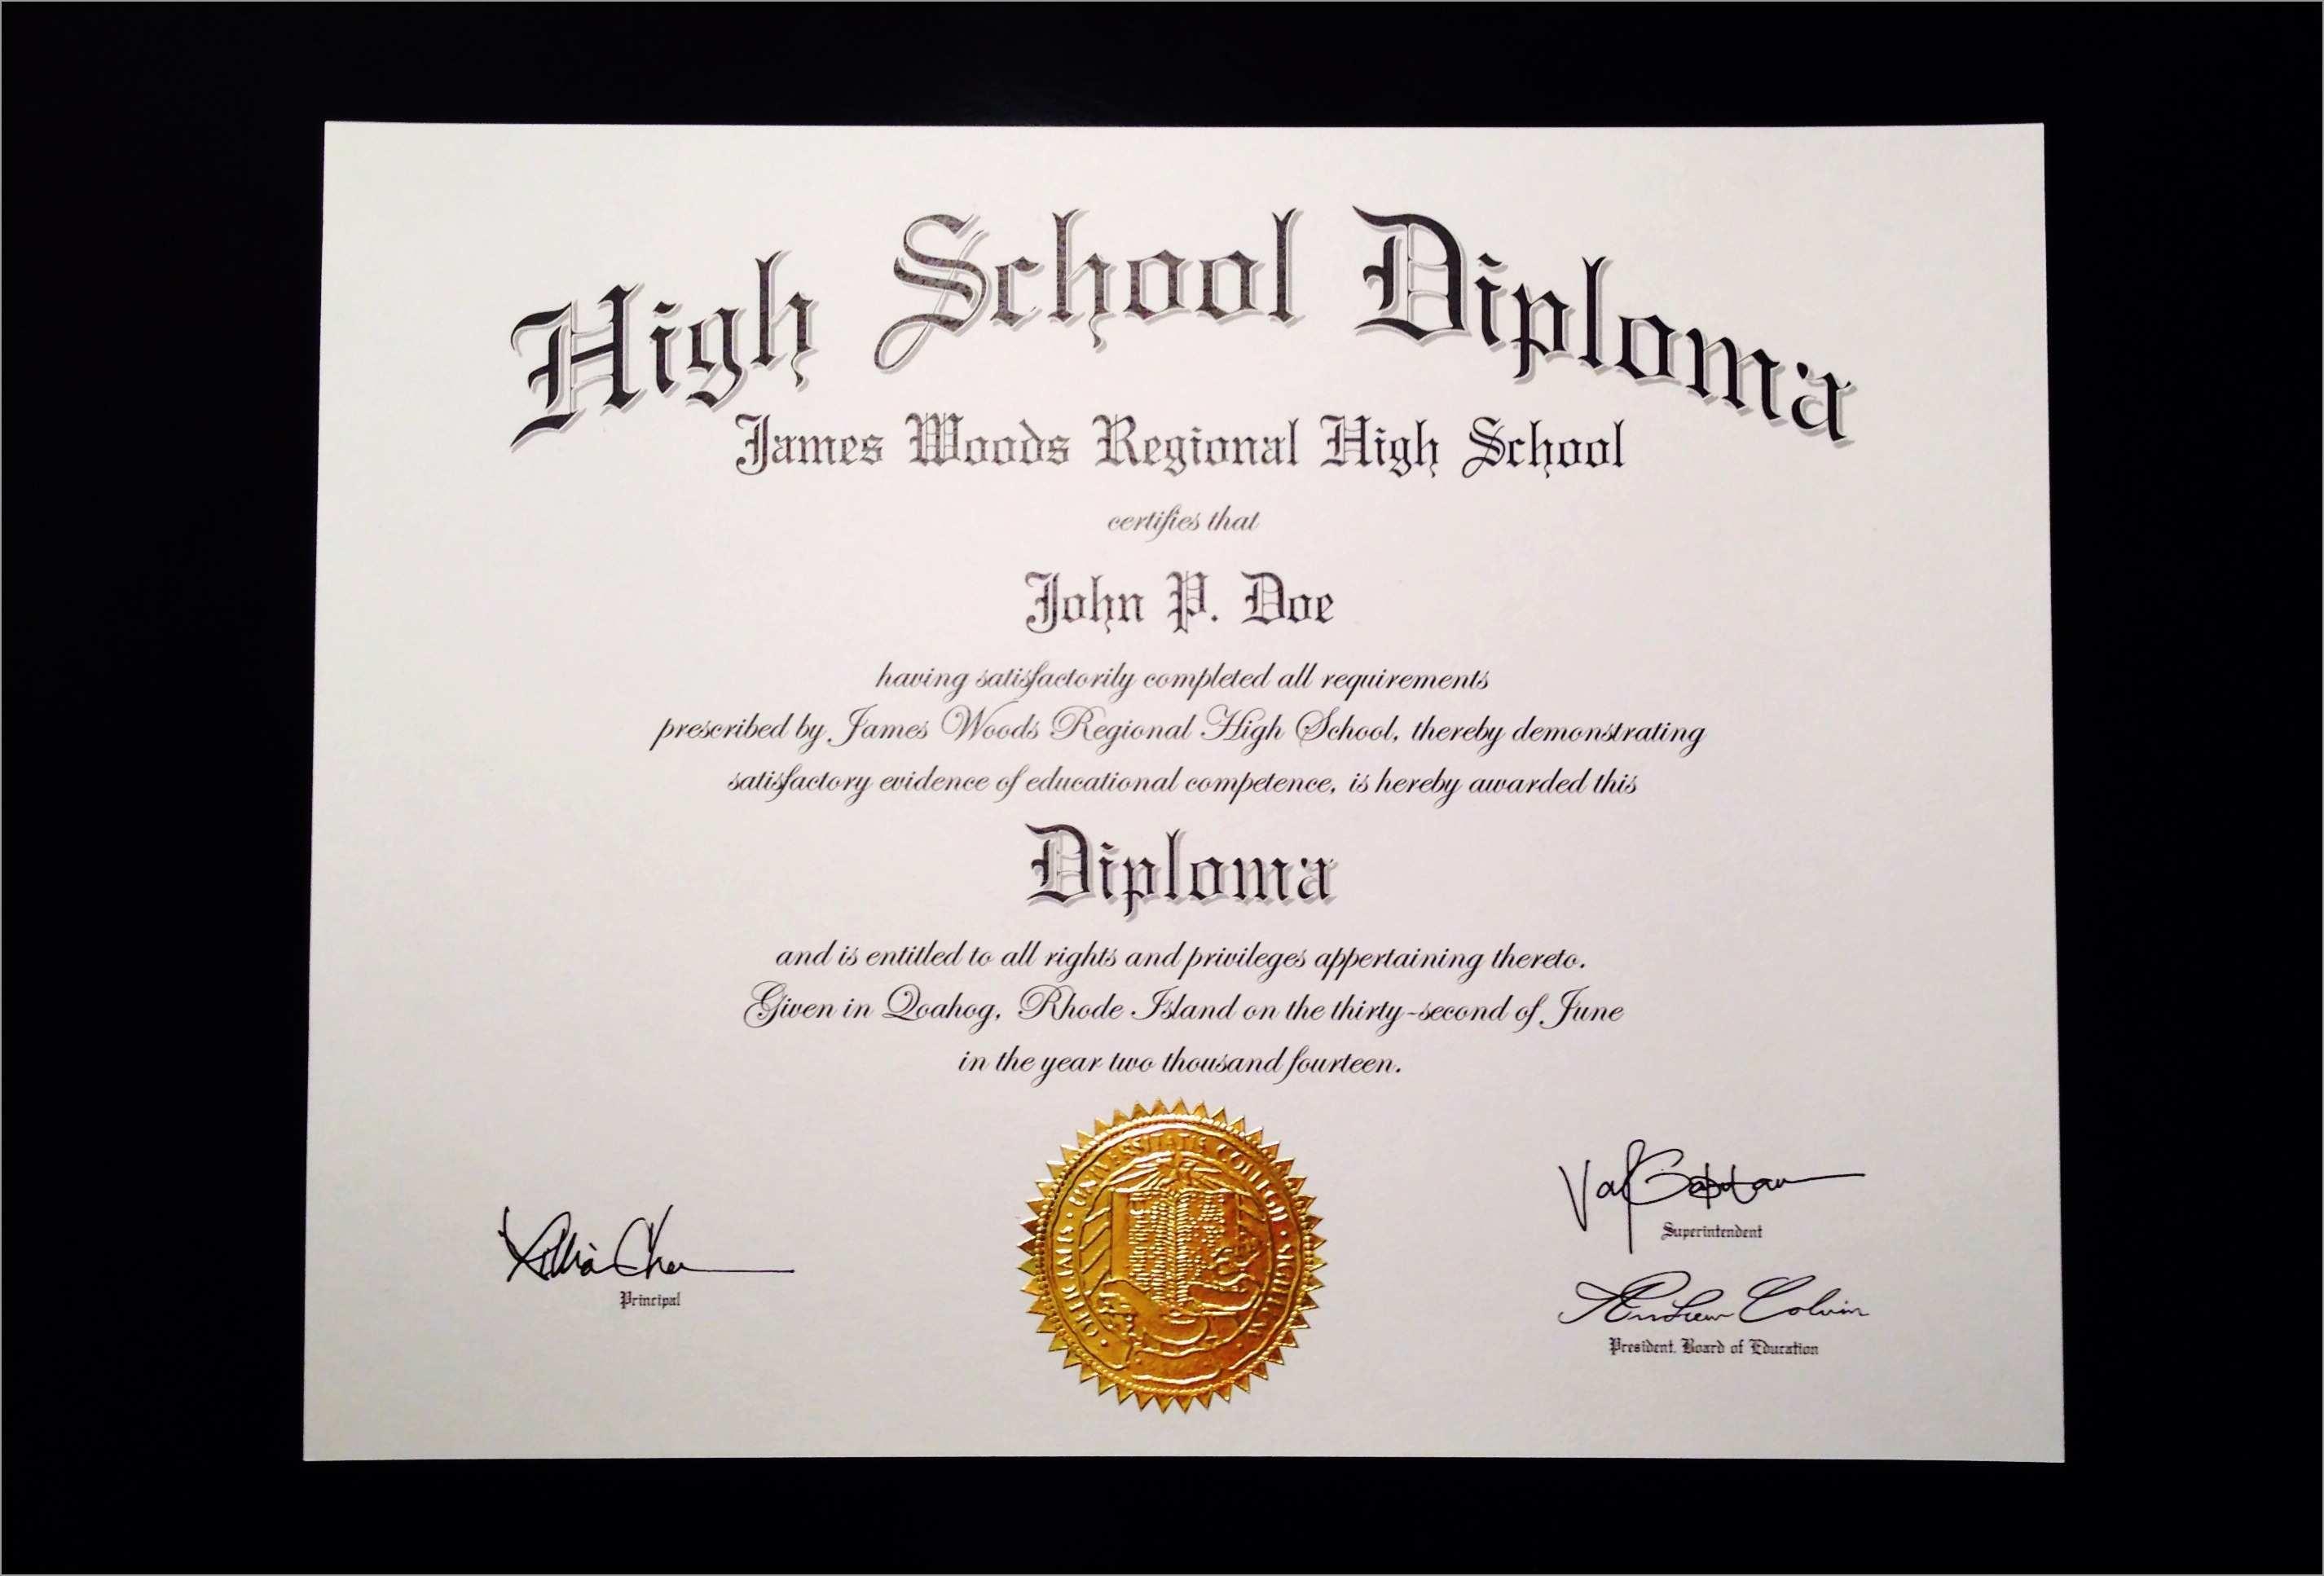 Best Of Free Printable Diploma Template | Best Of Template - Free Printable Diploma Template